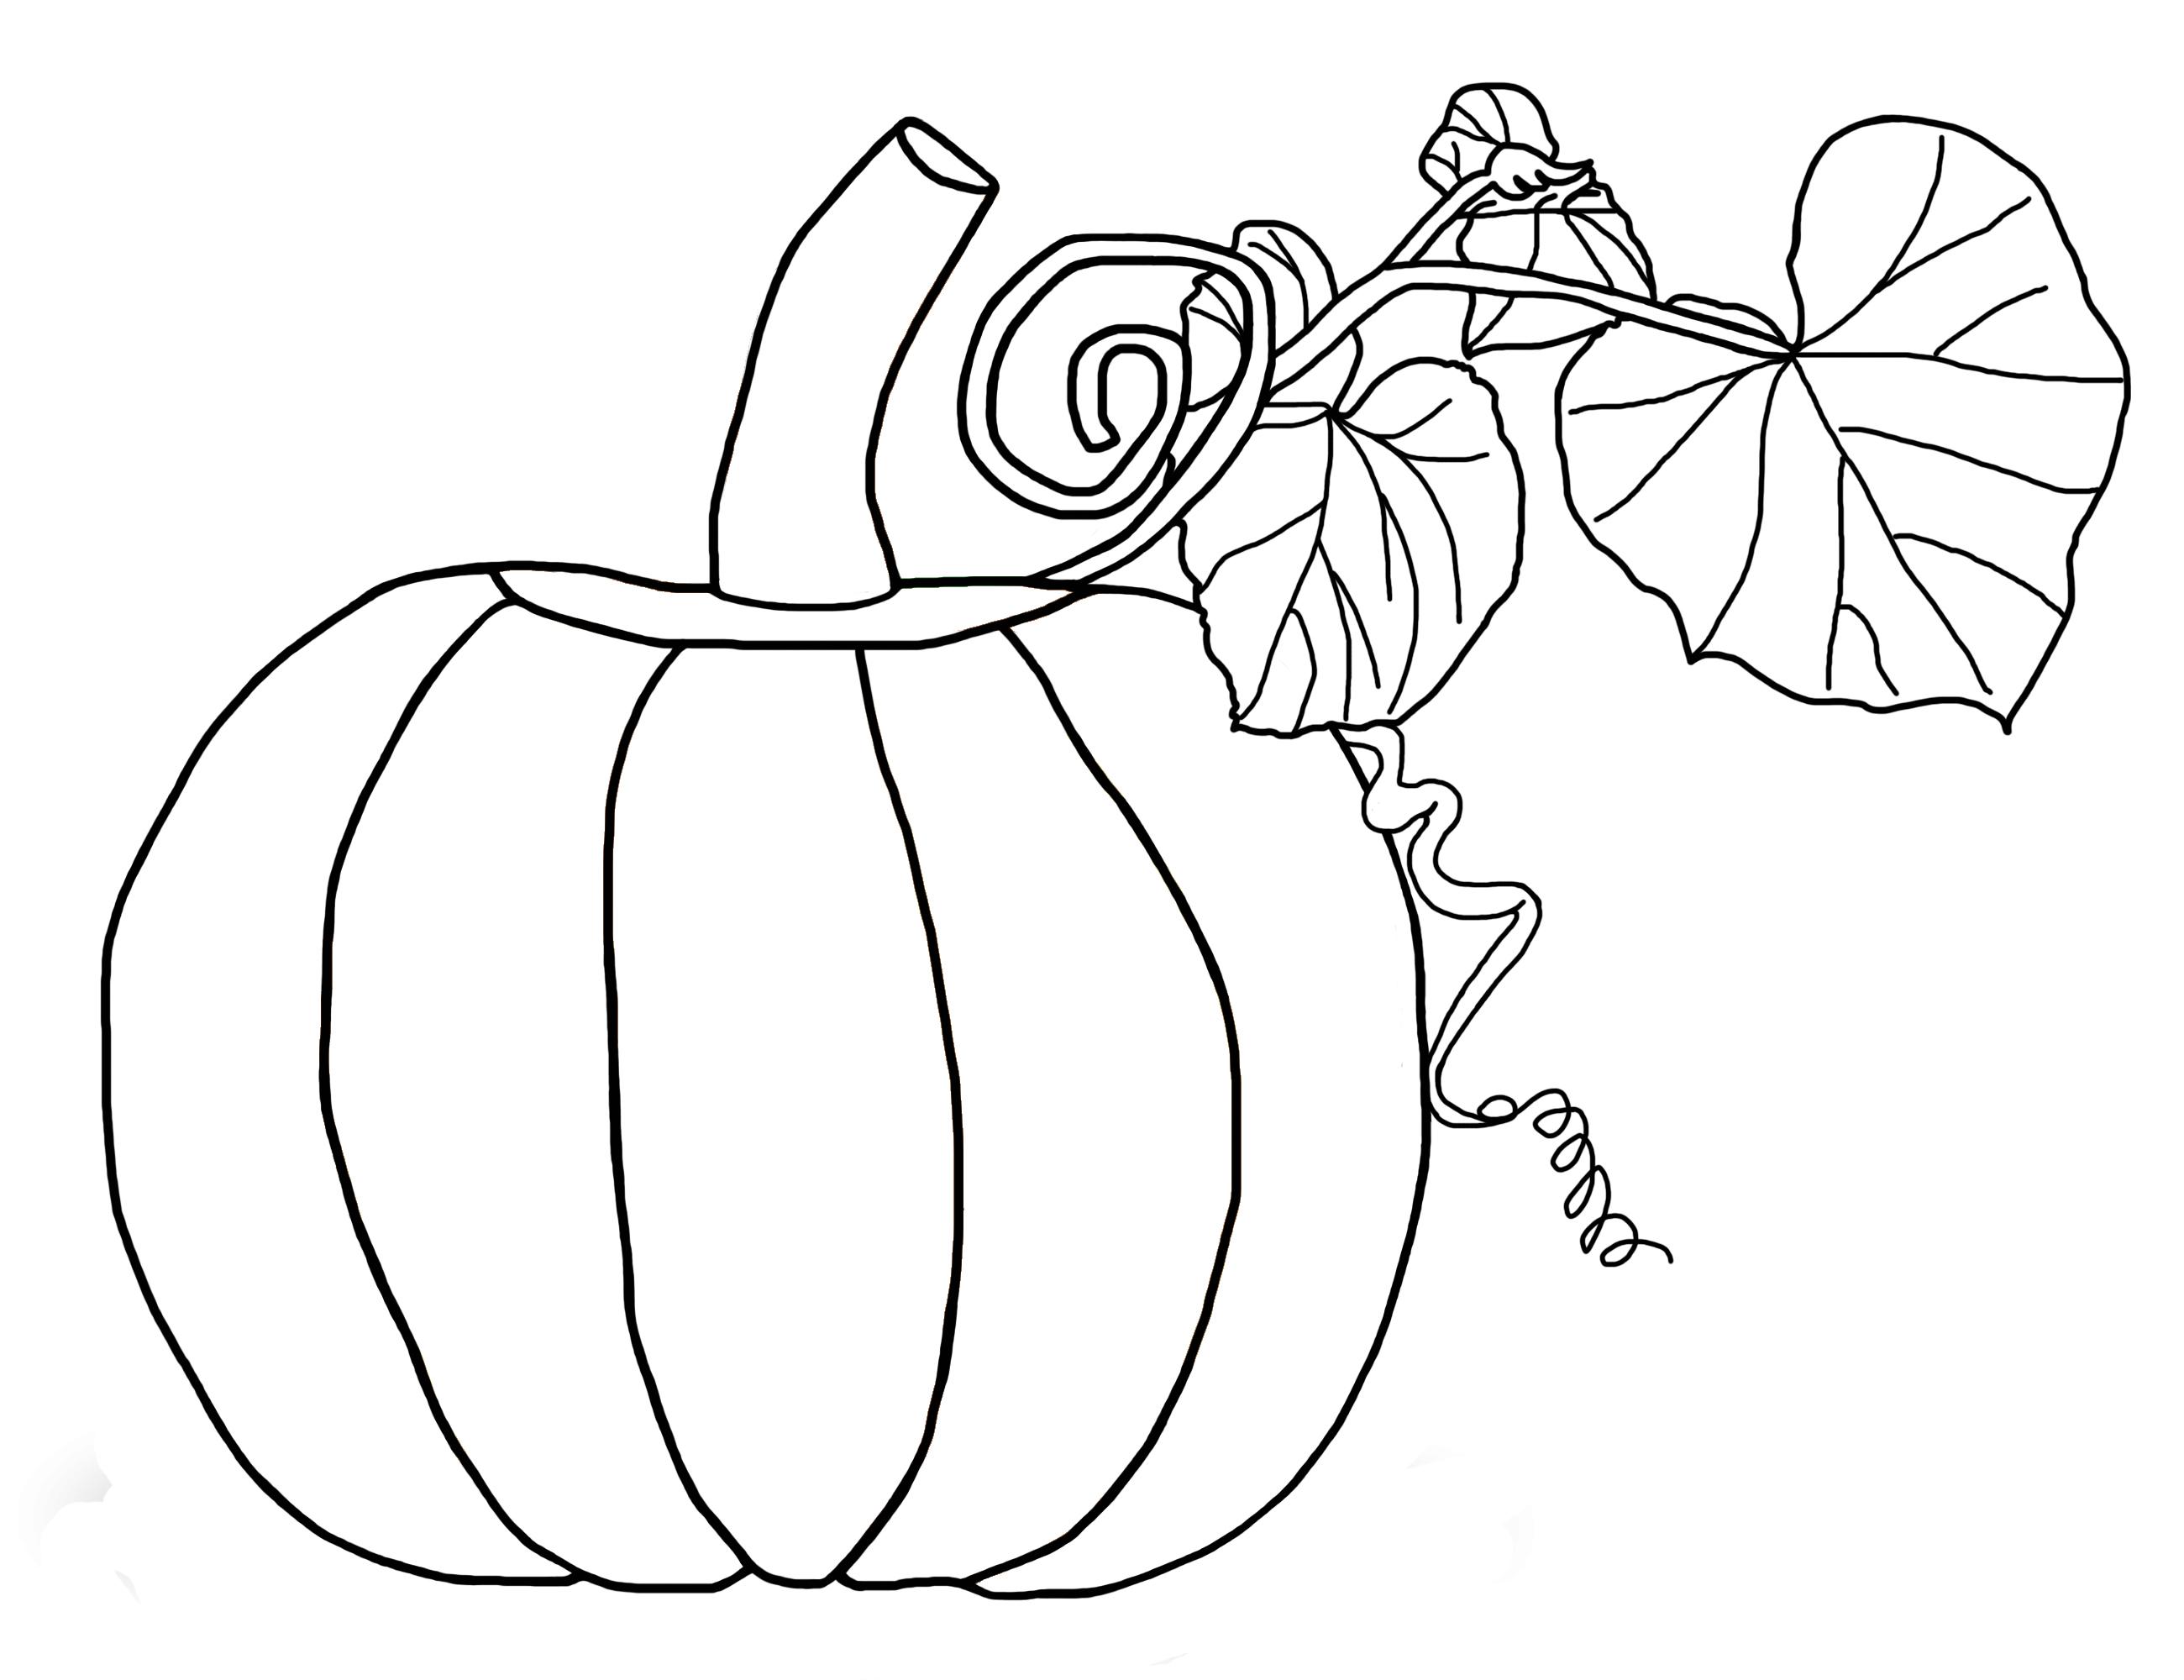 Atemberaubend Coloring Pumpkin Pages Ideen - Framing Malvorlagen ...